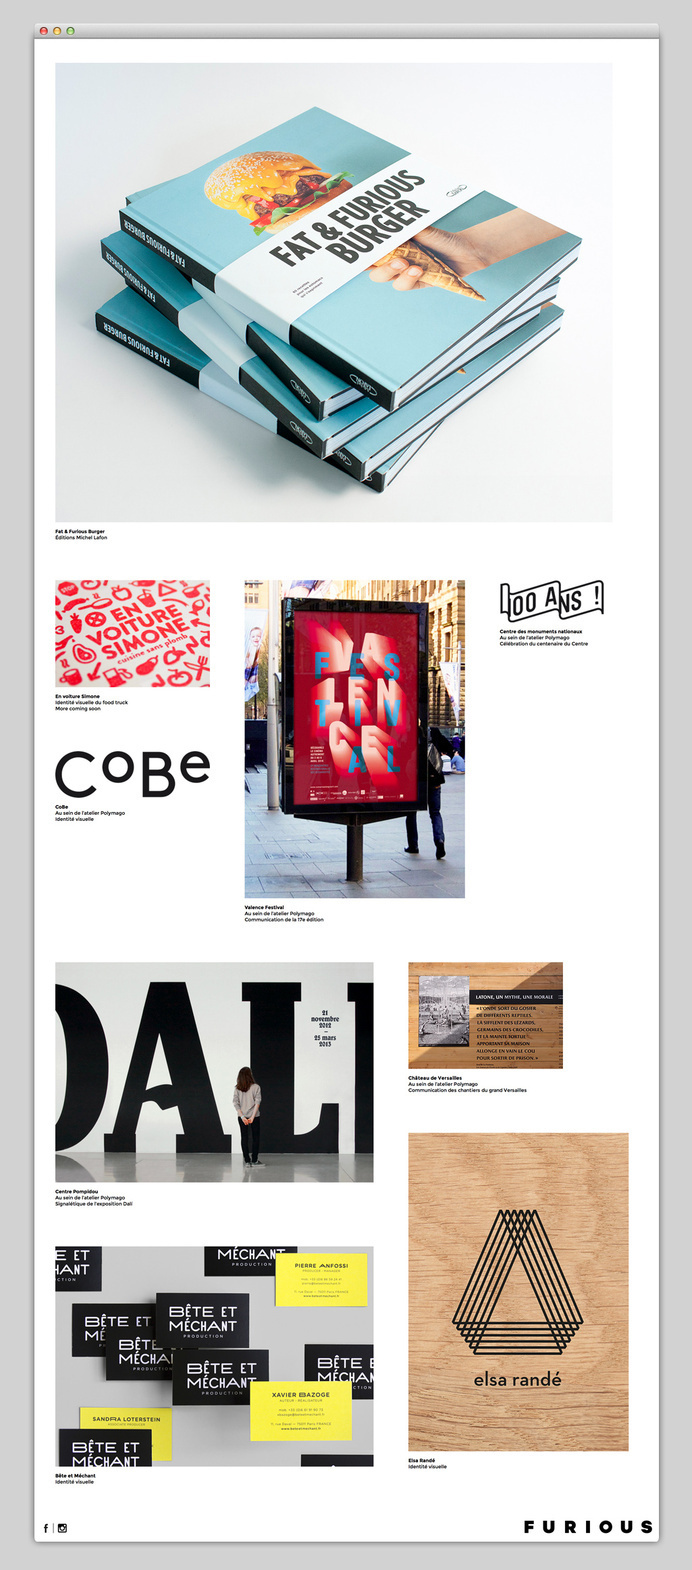 Websites We Love — Showcasing The Best in Web Design #agency #design #best #website #ui #minimal #webdesign #web #typography